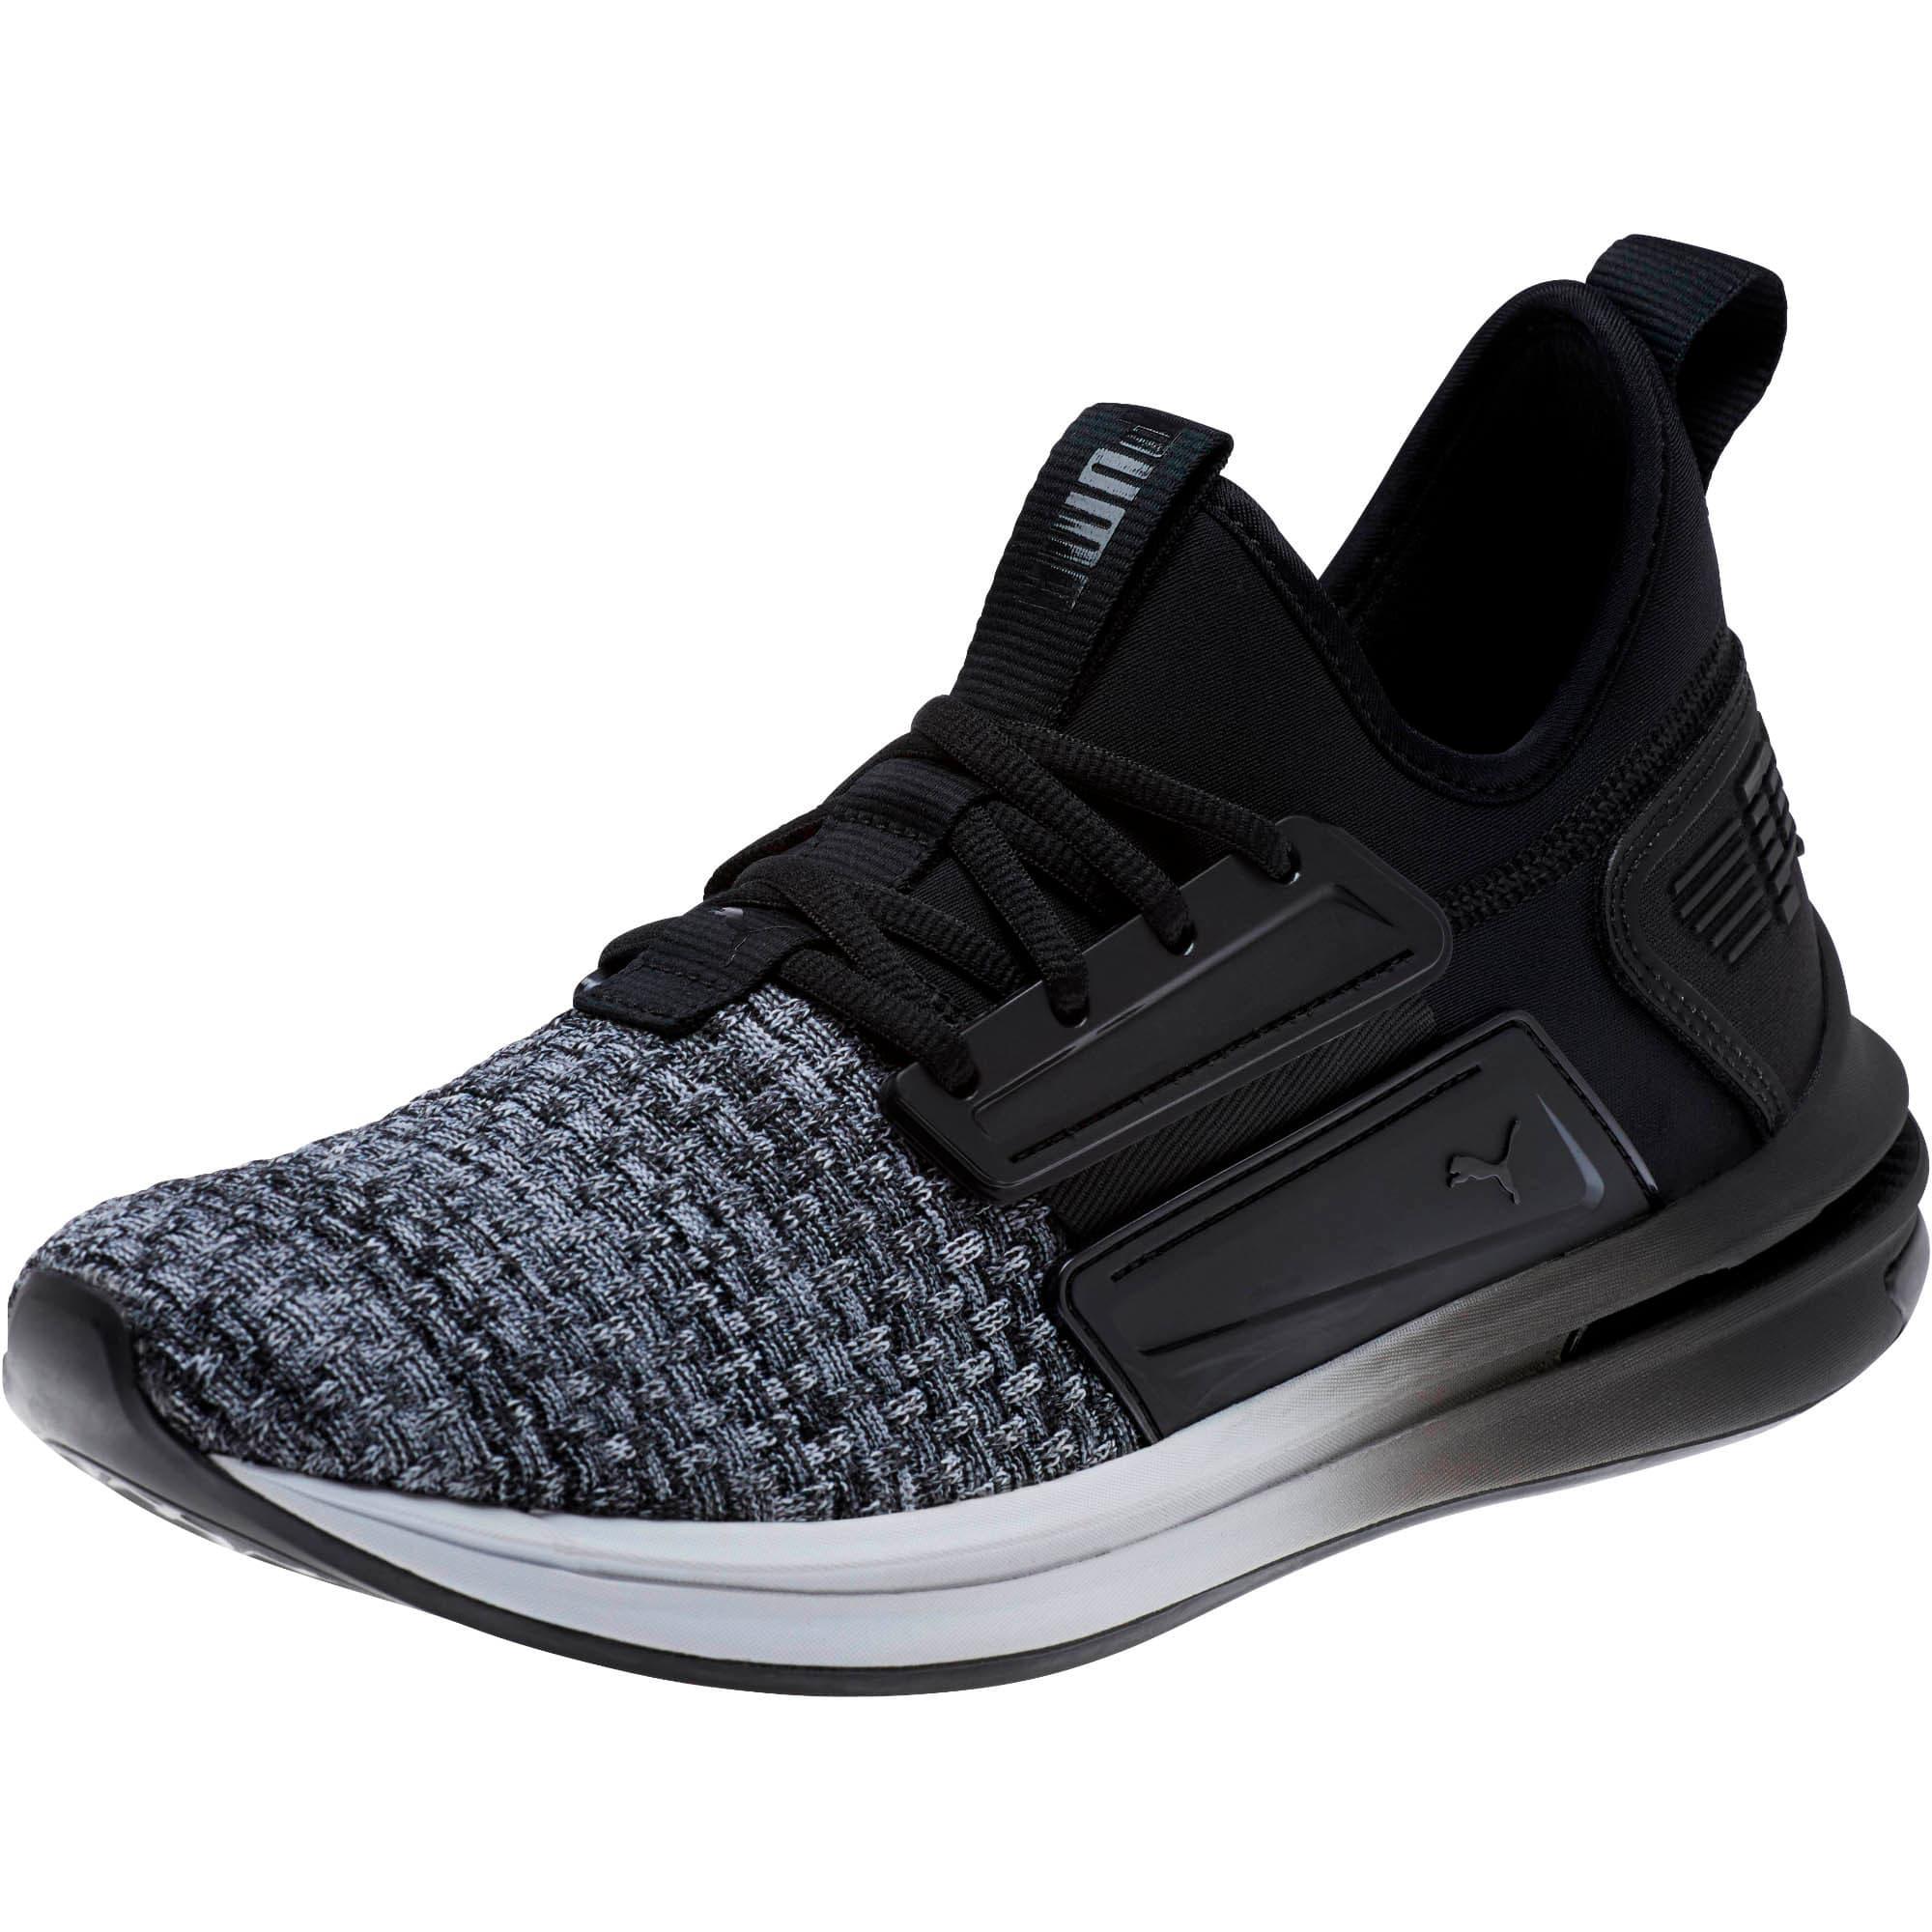 reputable site c084b 40888 IGNITE Limitless SR Escape Sneakers